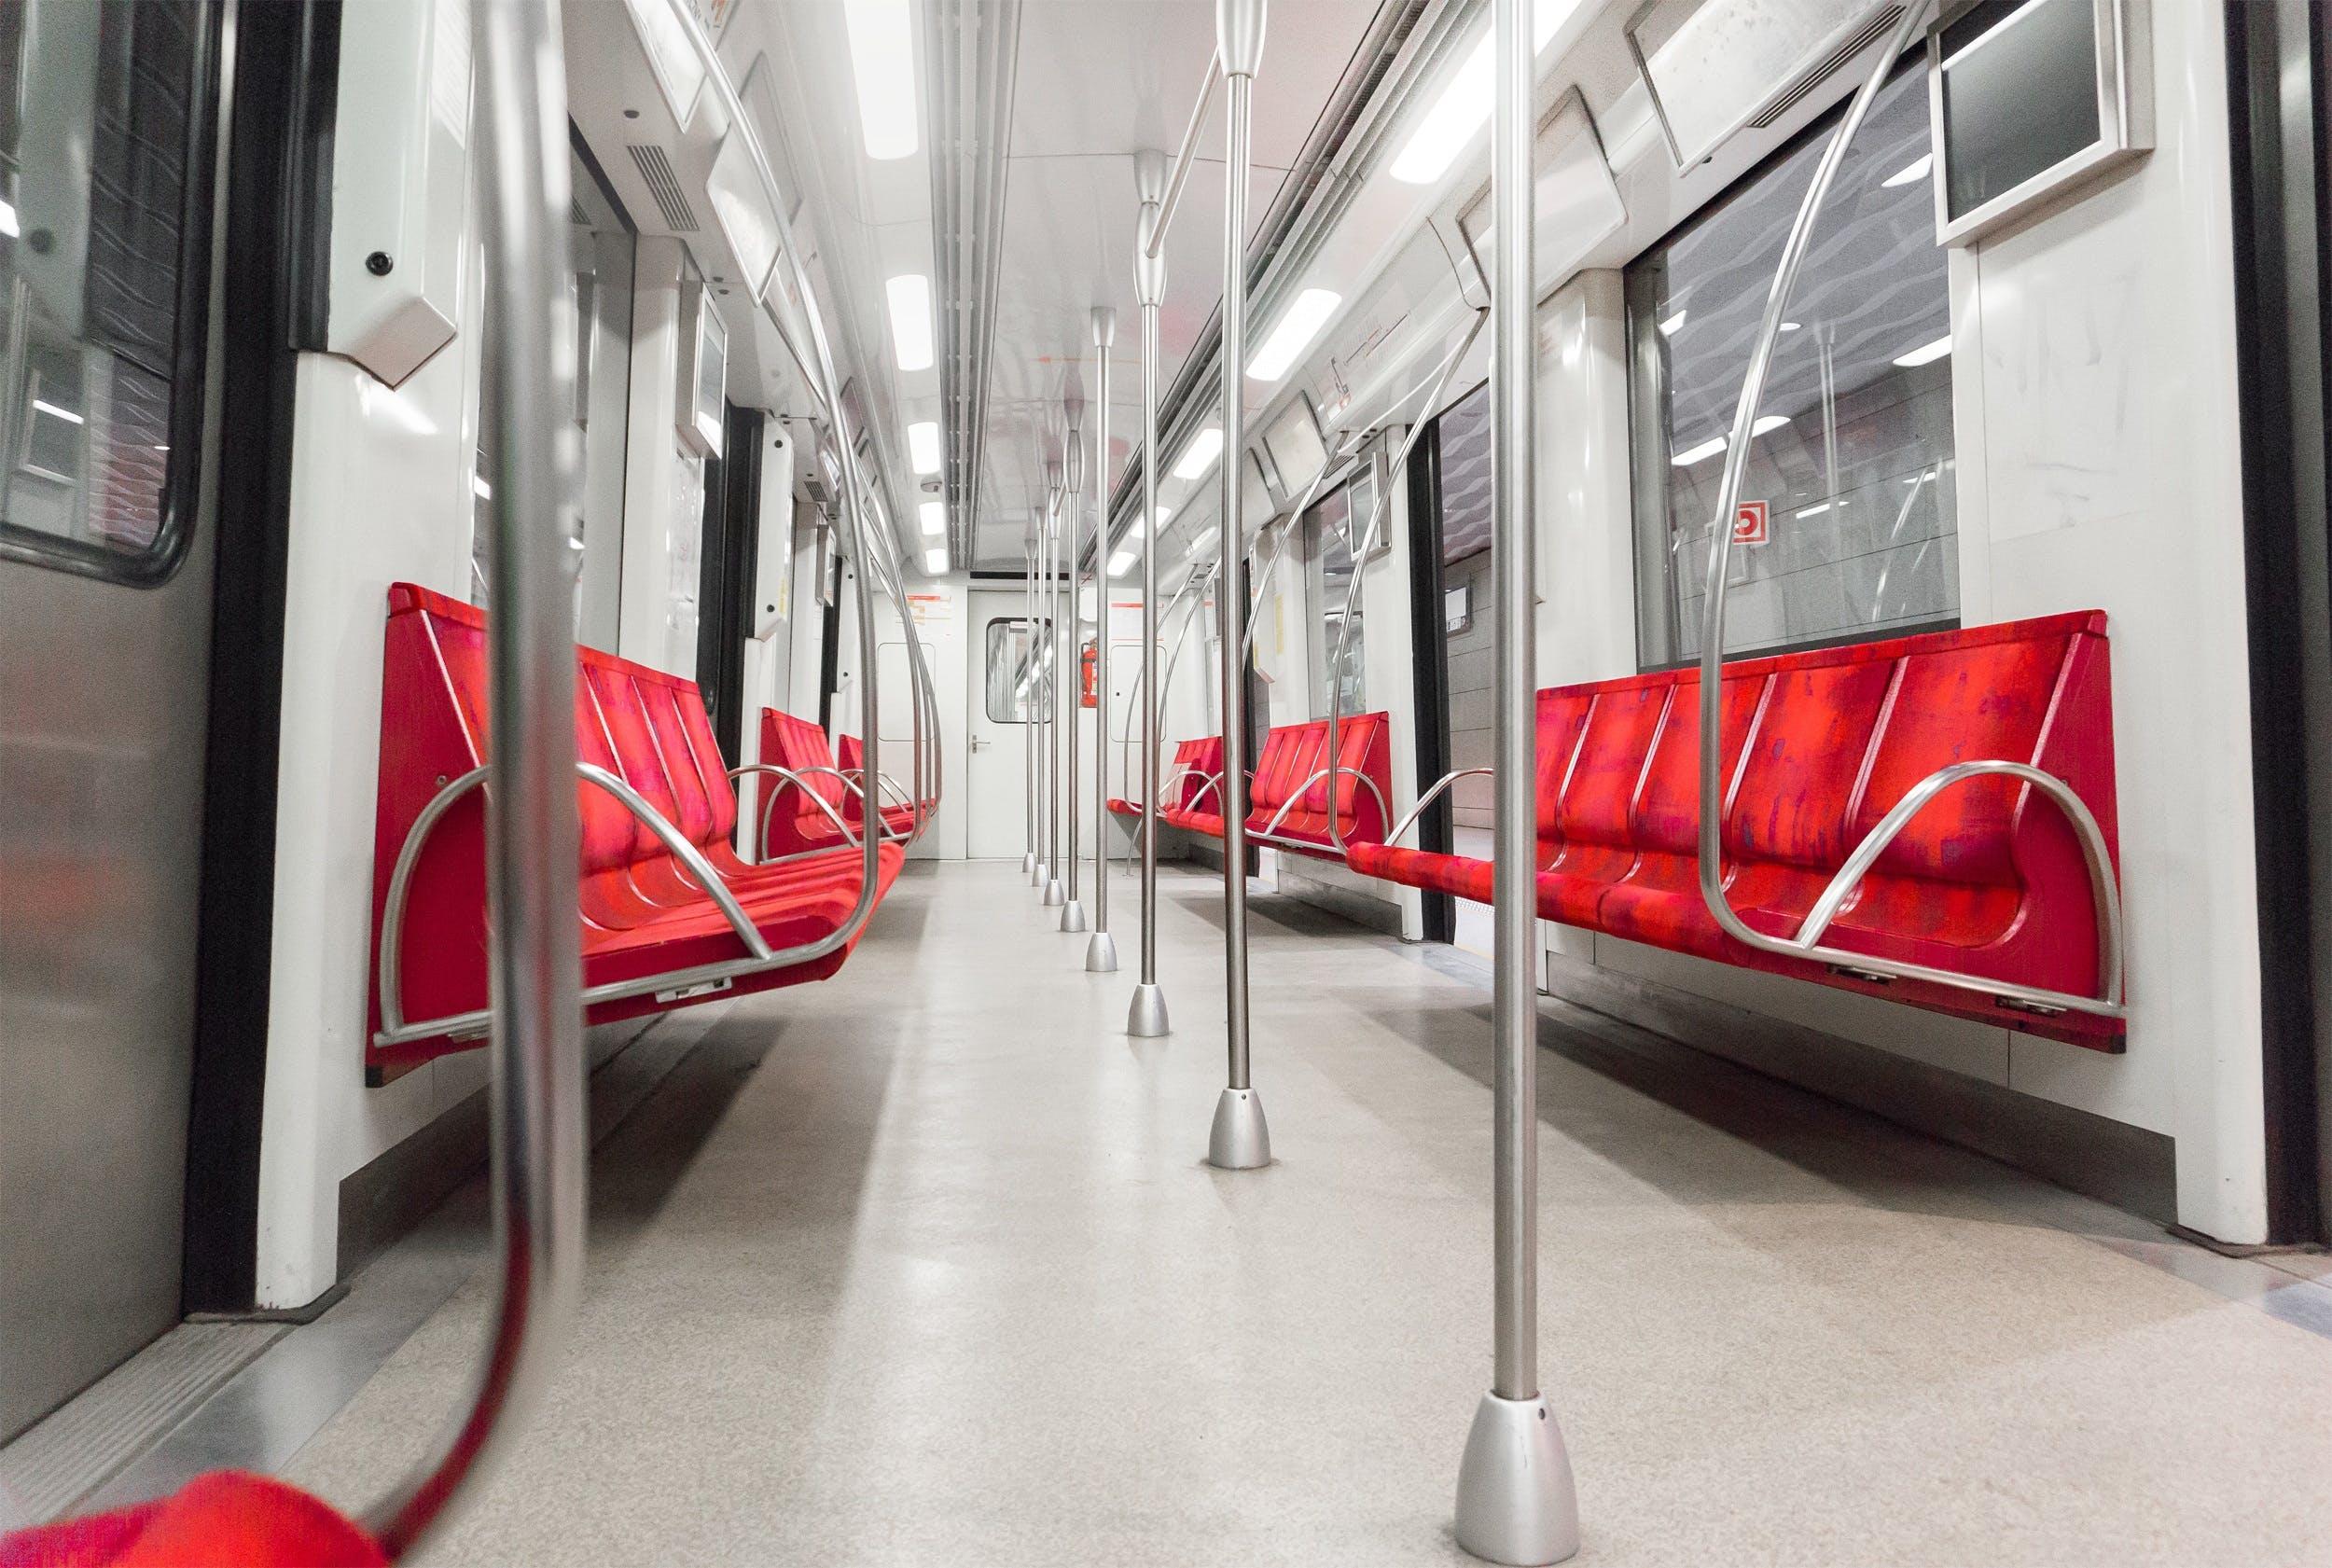 Free stock photo of train, metal, public transportation, windows